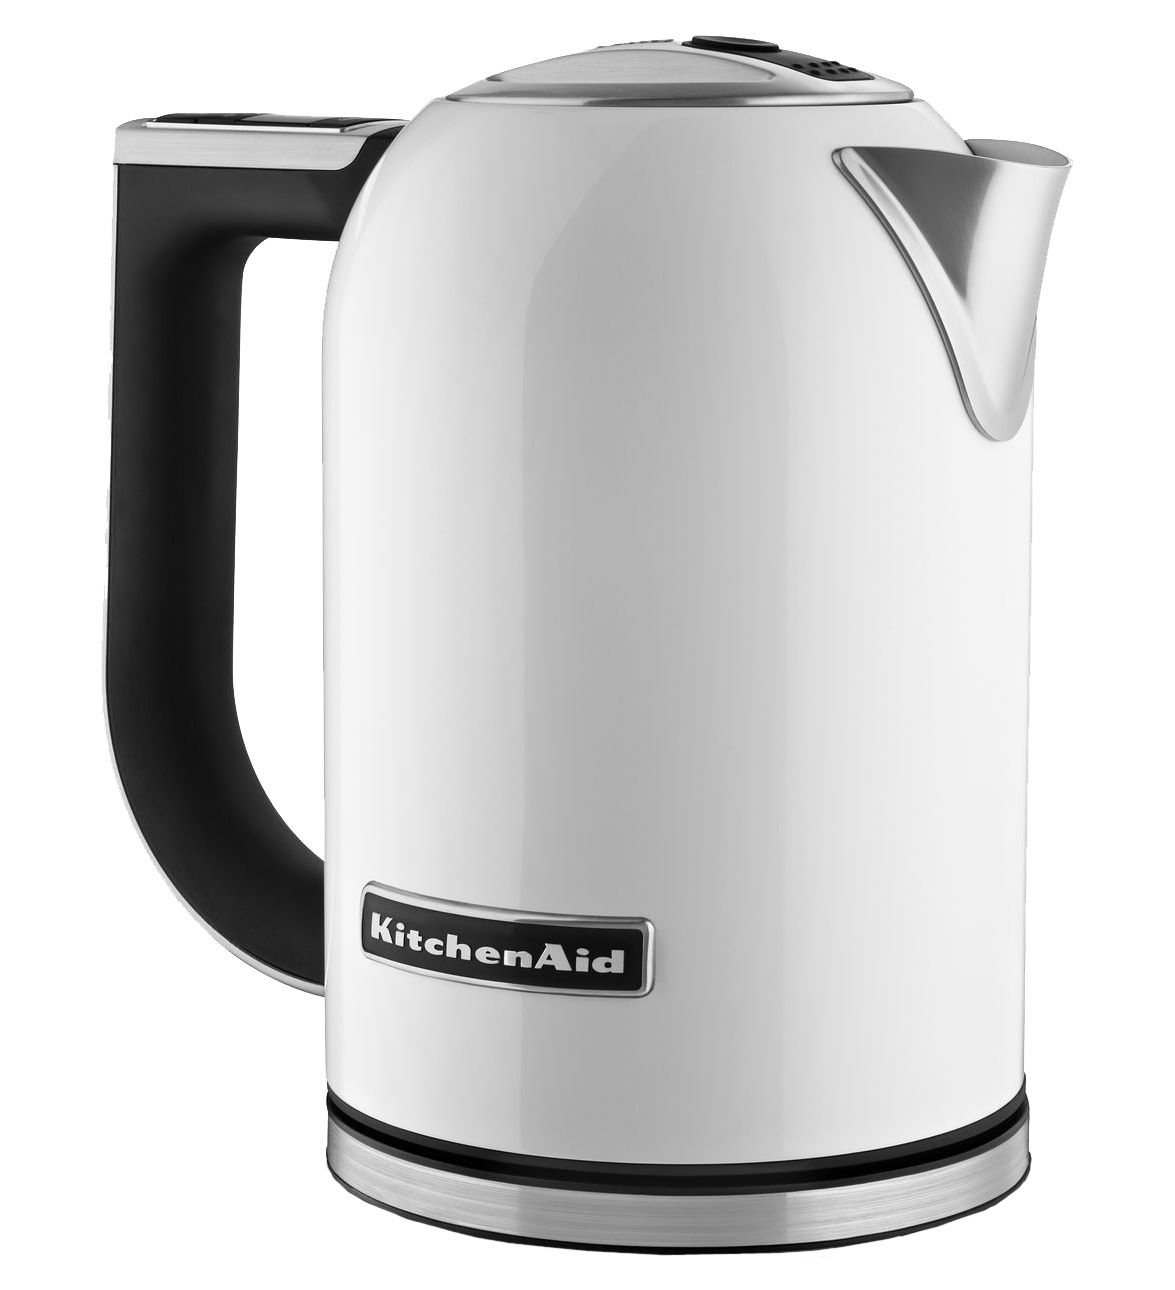 Kitchenaid White Electric Kettle Kek1722wh Abt